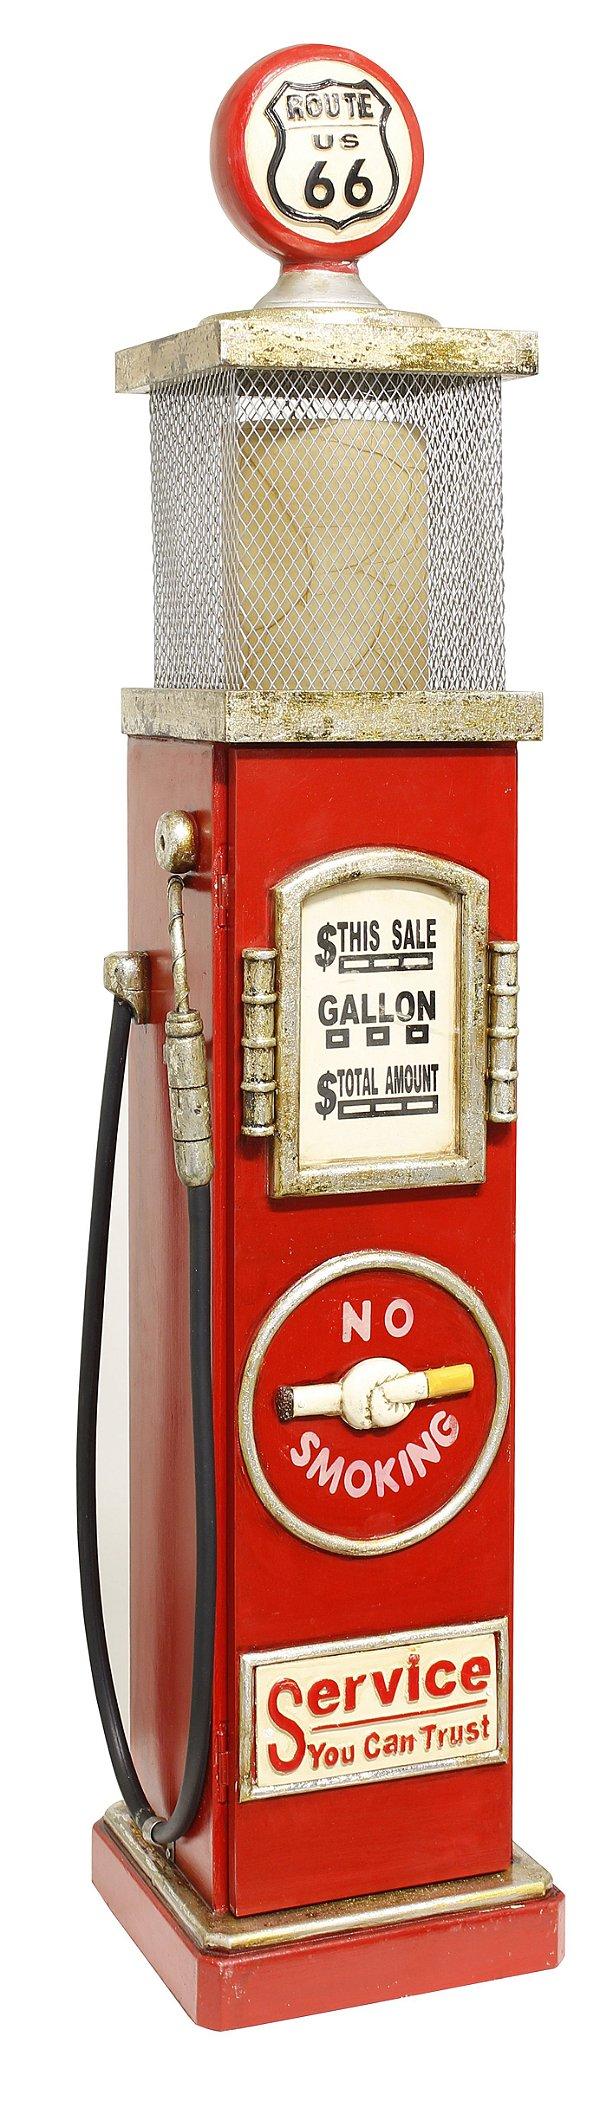 bomba gasolina iluminada rout 66 vermelha oldway 109x23x23cm